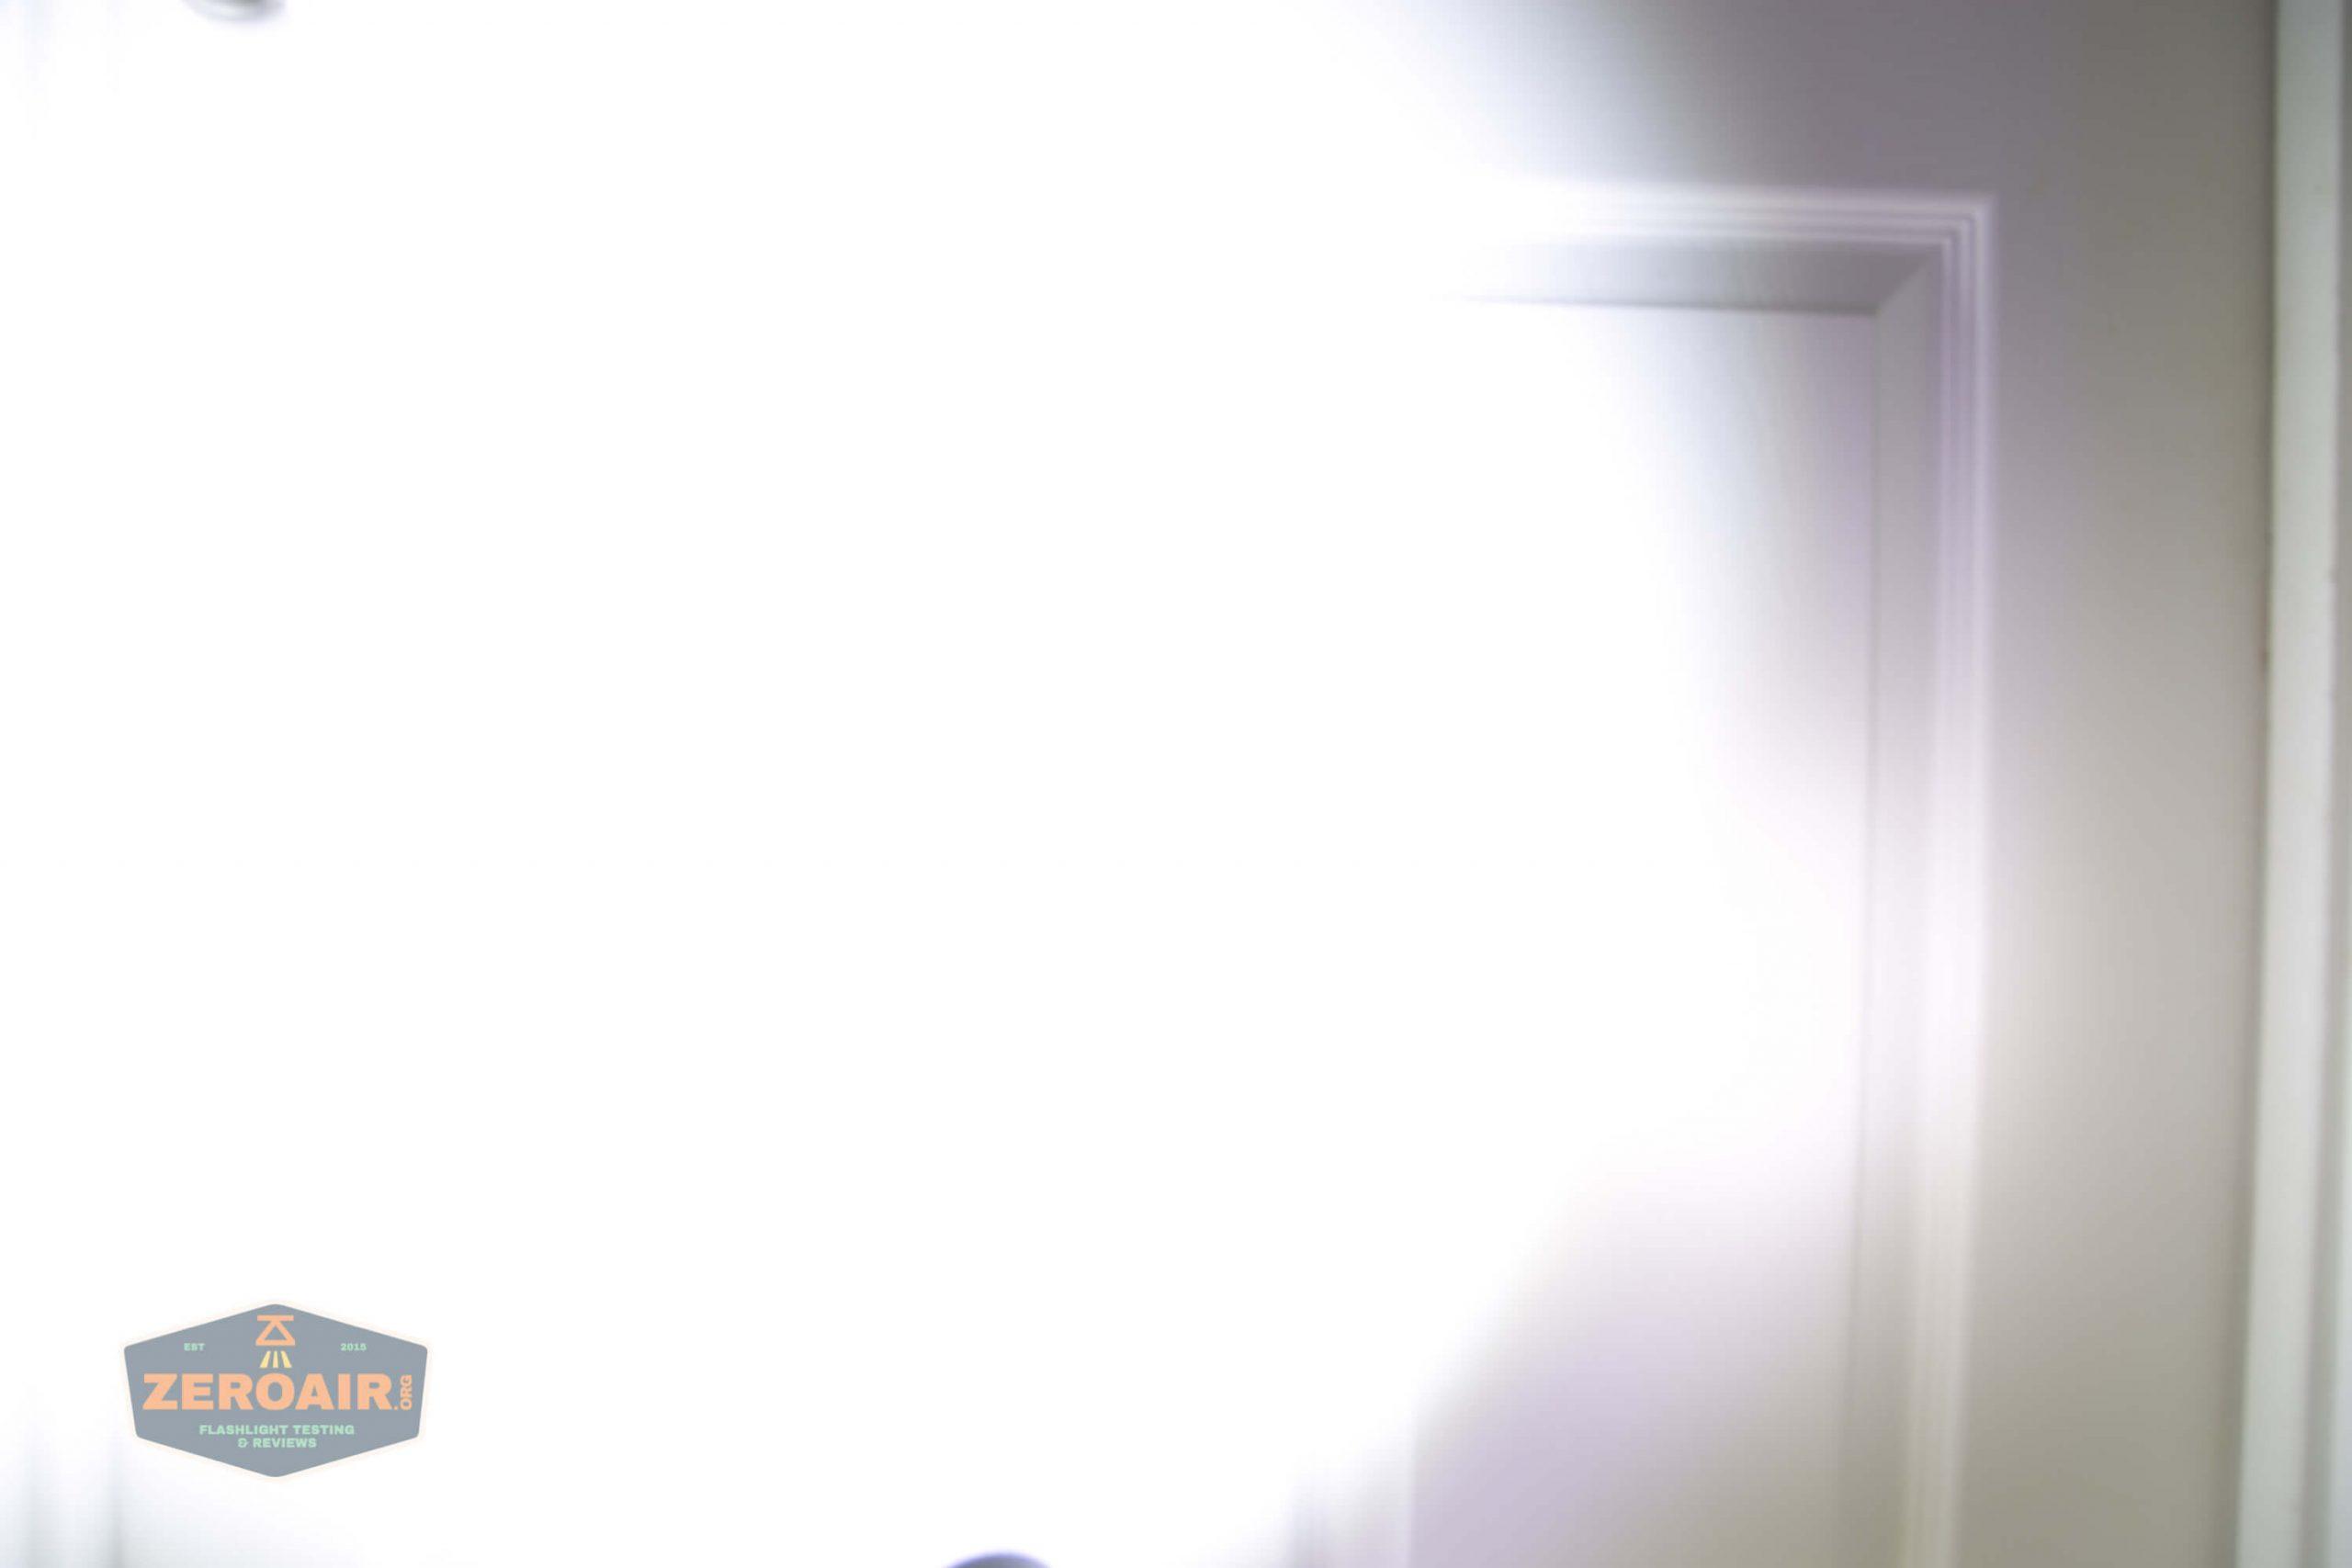 klarus g25 21700 cree xhp70.2 flashlight beamshot door turbo